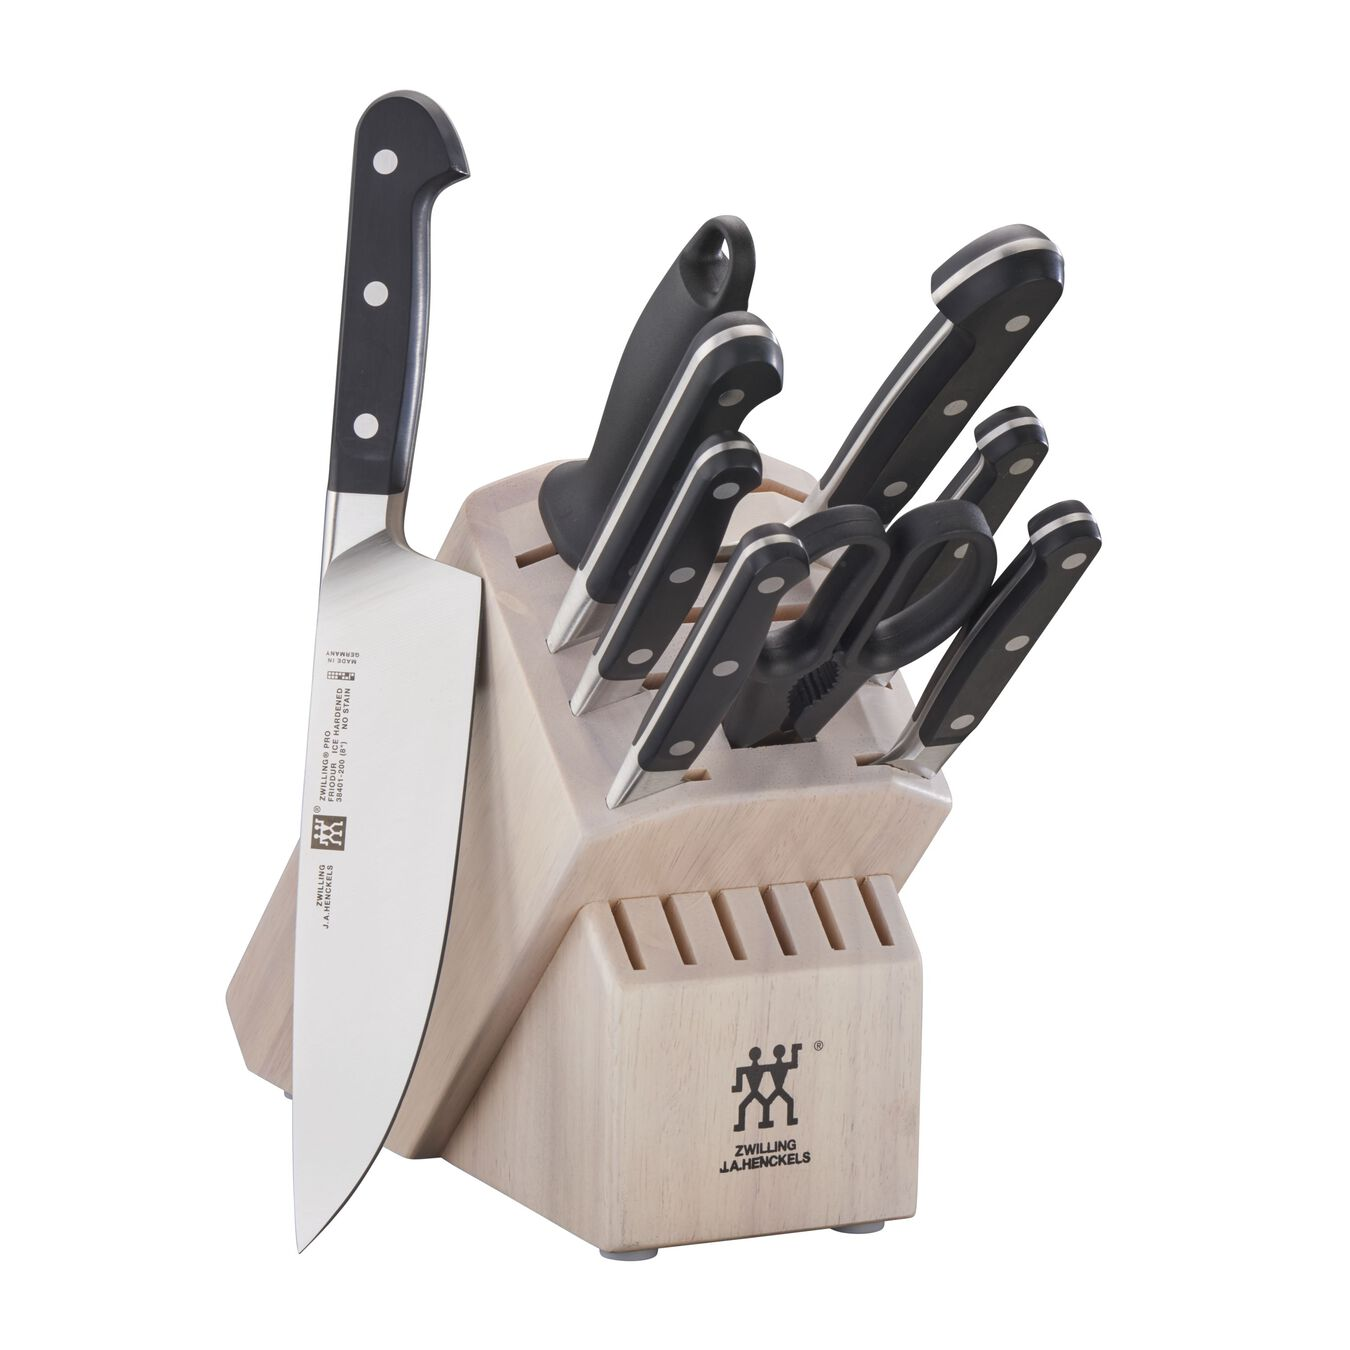 10-pc Knife Block Set - White,,large 1